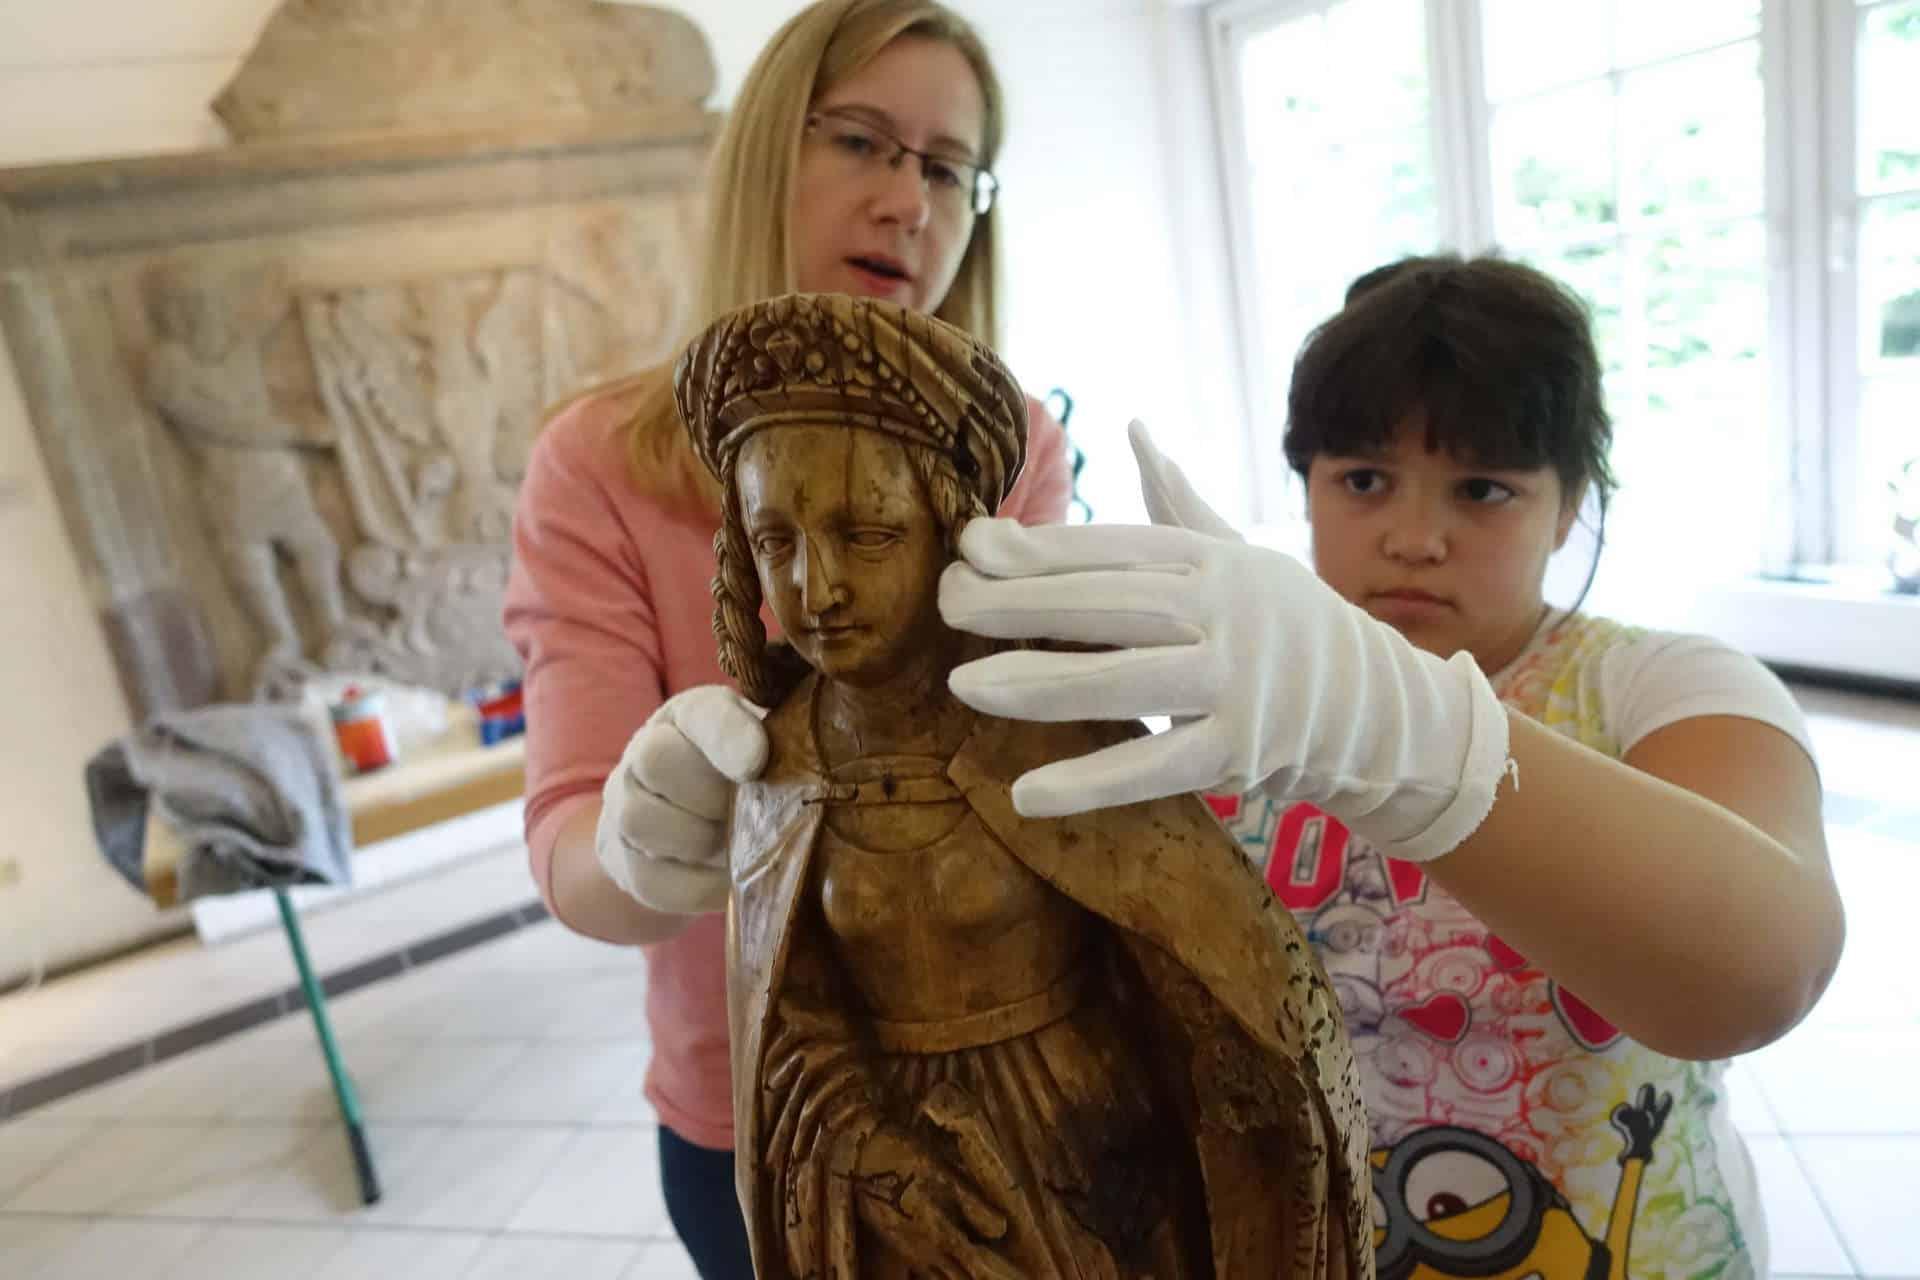 Partizipatives Kunstprojekt Goch Schnitzen mit Kindern